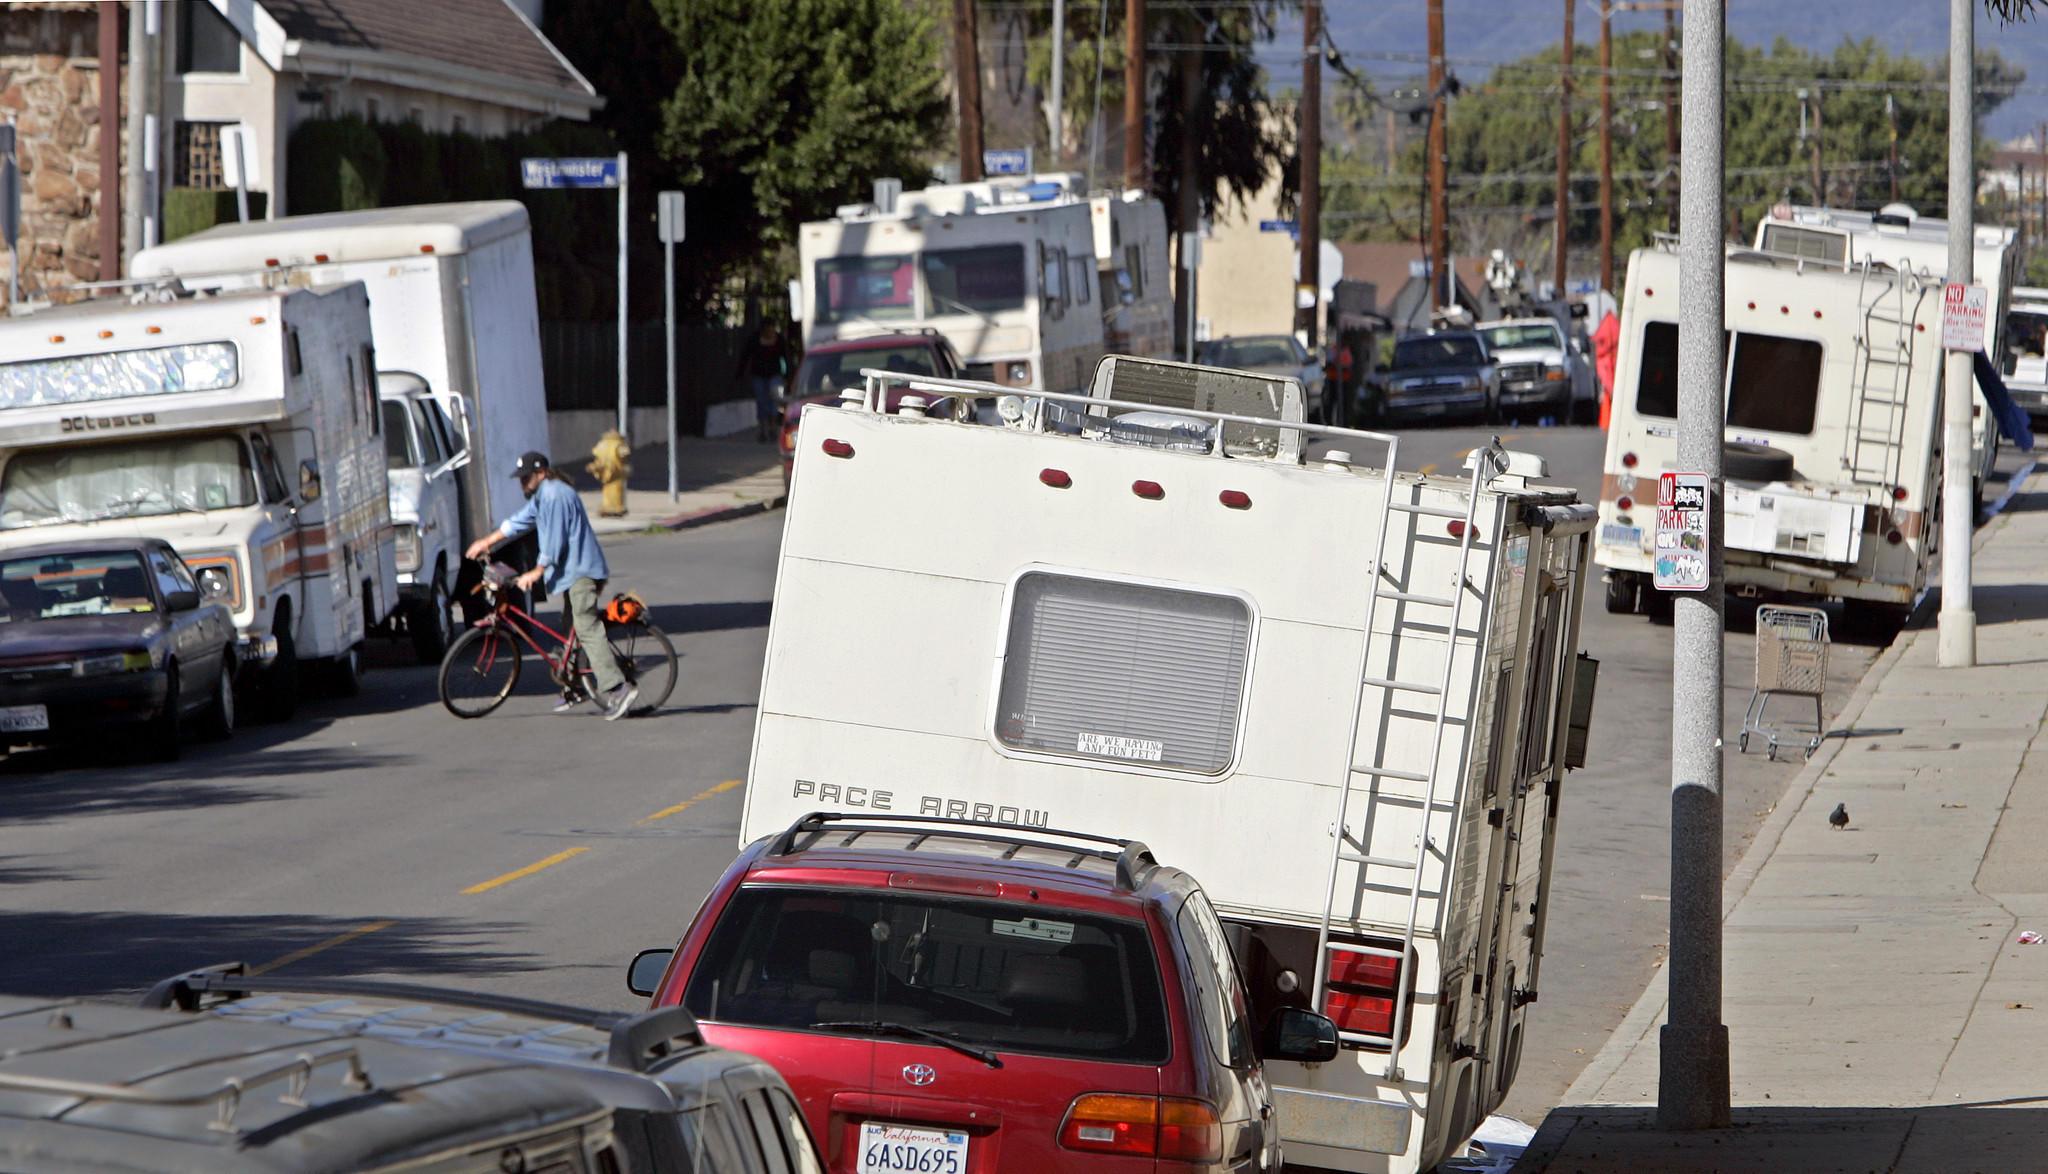 Venice group drops bid to limit overnight parking - latimes